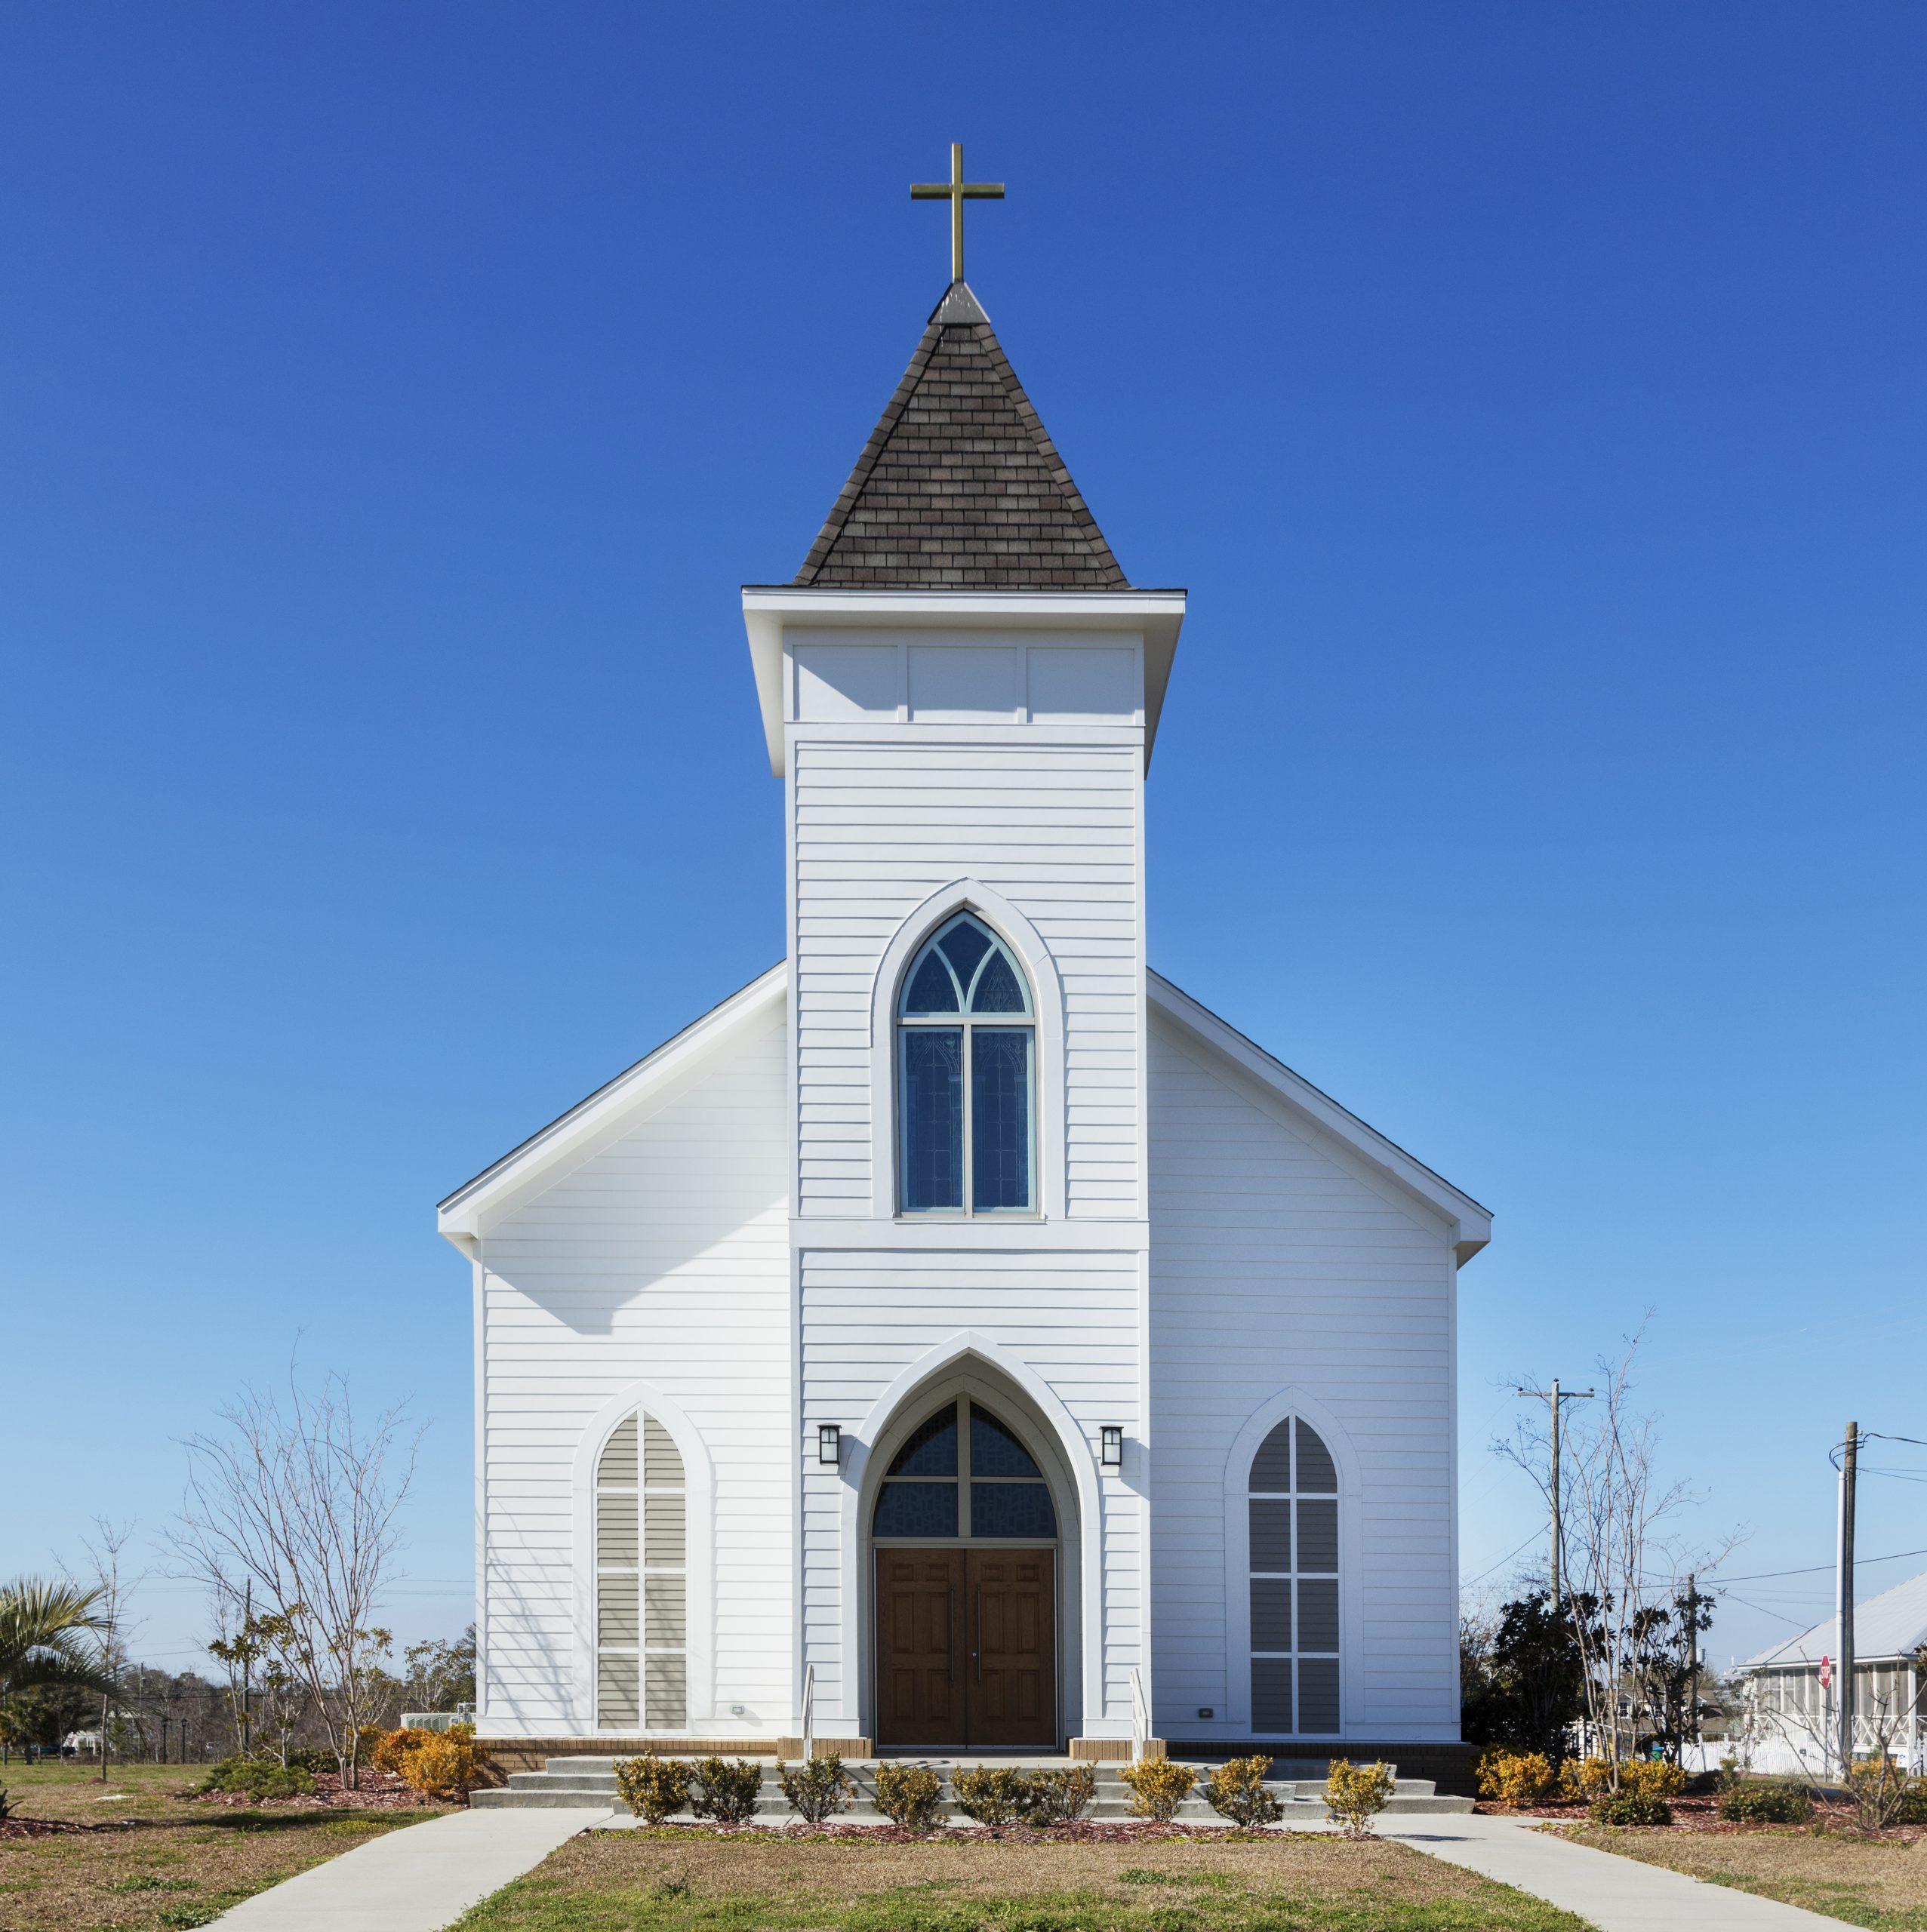 California Can't Enforce Indoor Church Service Ban